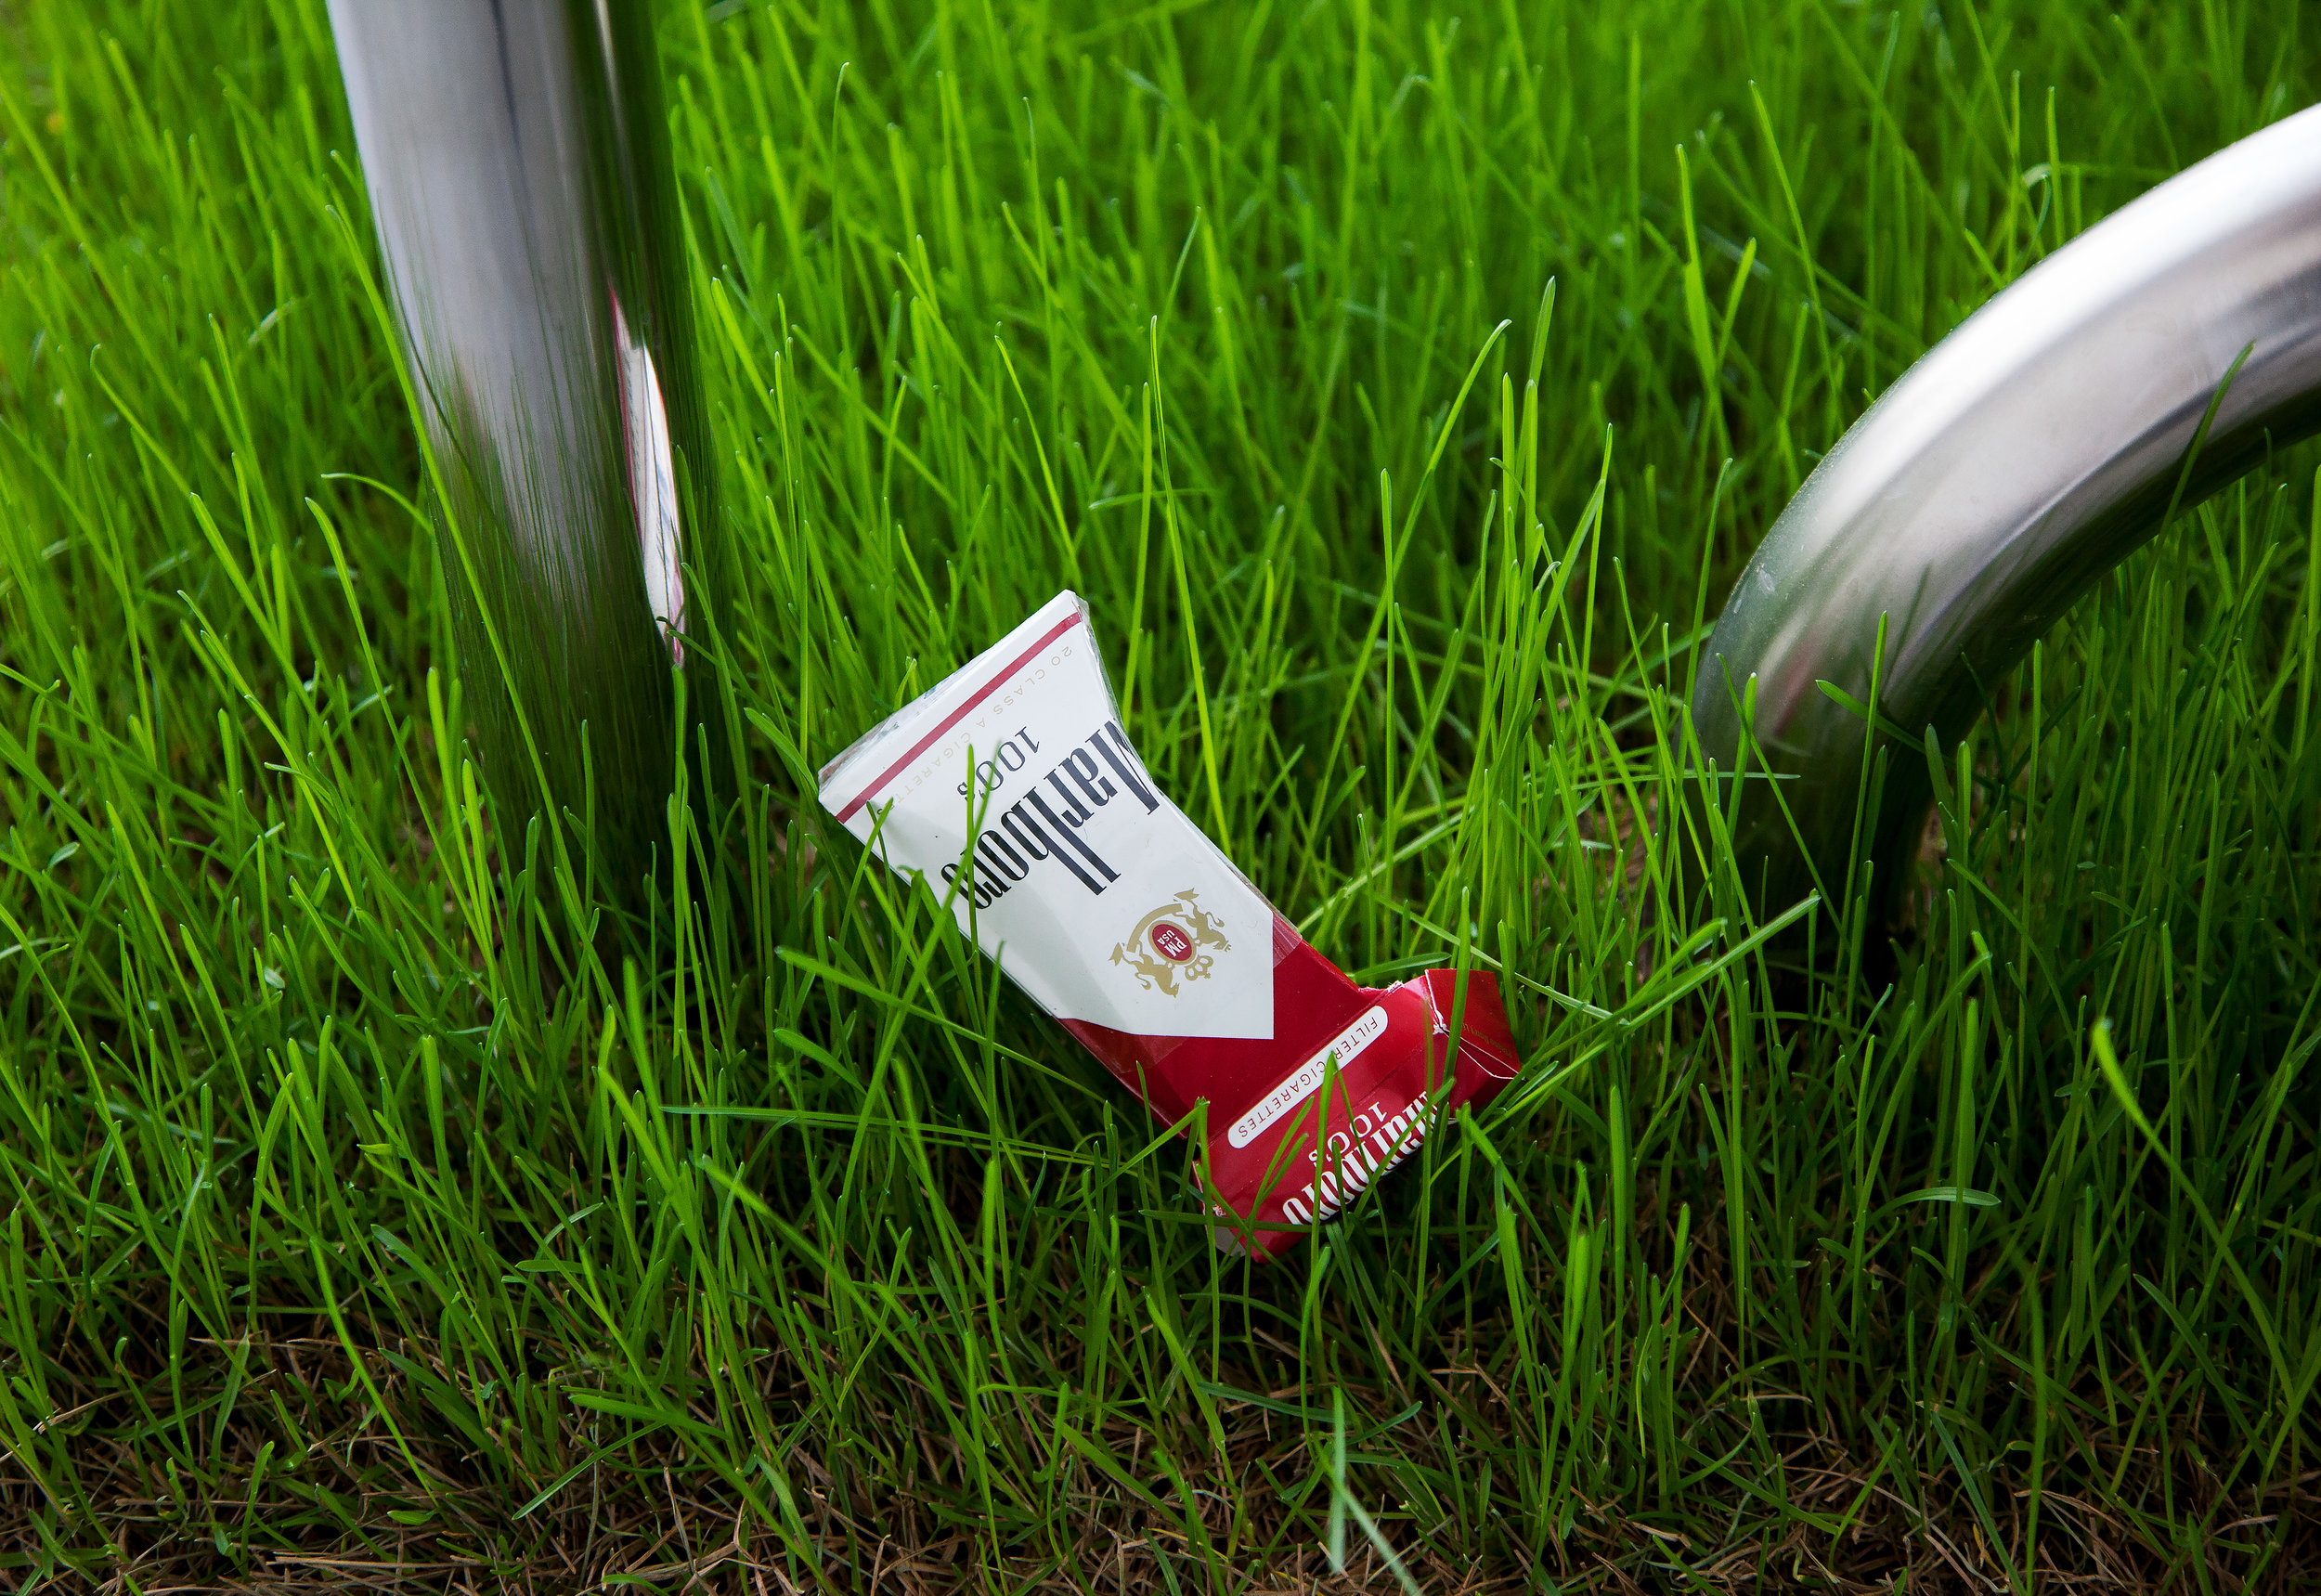 "Hand Rails  ,  detail, 2014, stainless steel, grass, soil, wood base, one empty pack of Marlboro Reds 100's, 36""x 36"" x 36"" (91.4 cm x 91.4 cm x 91.4 cm)"